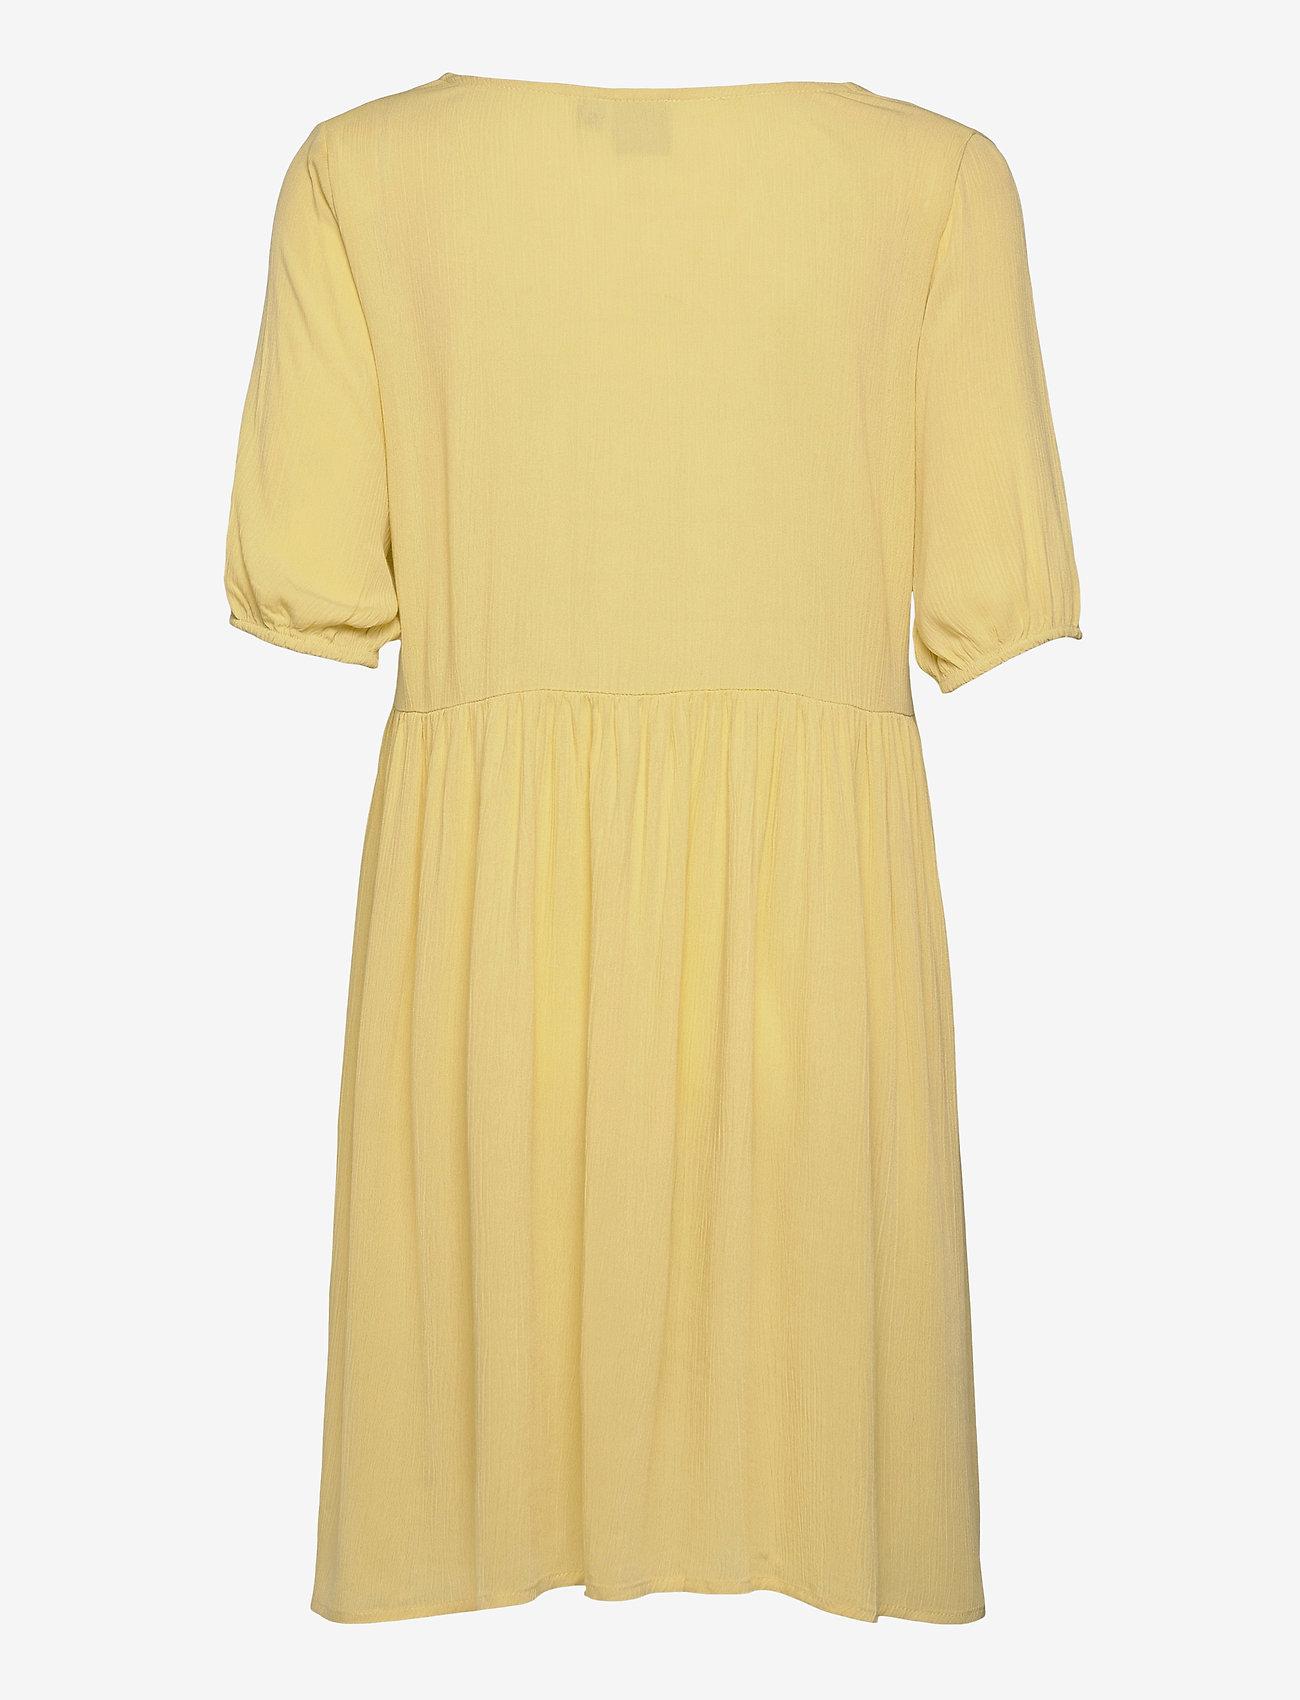 ICHI - IHMARRAKECH SO DR7 - summer dresses - golden mist - 1